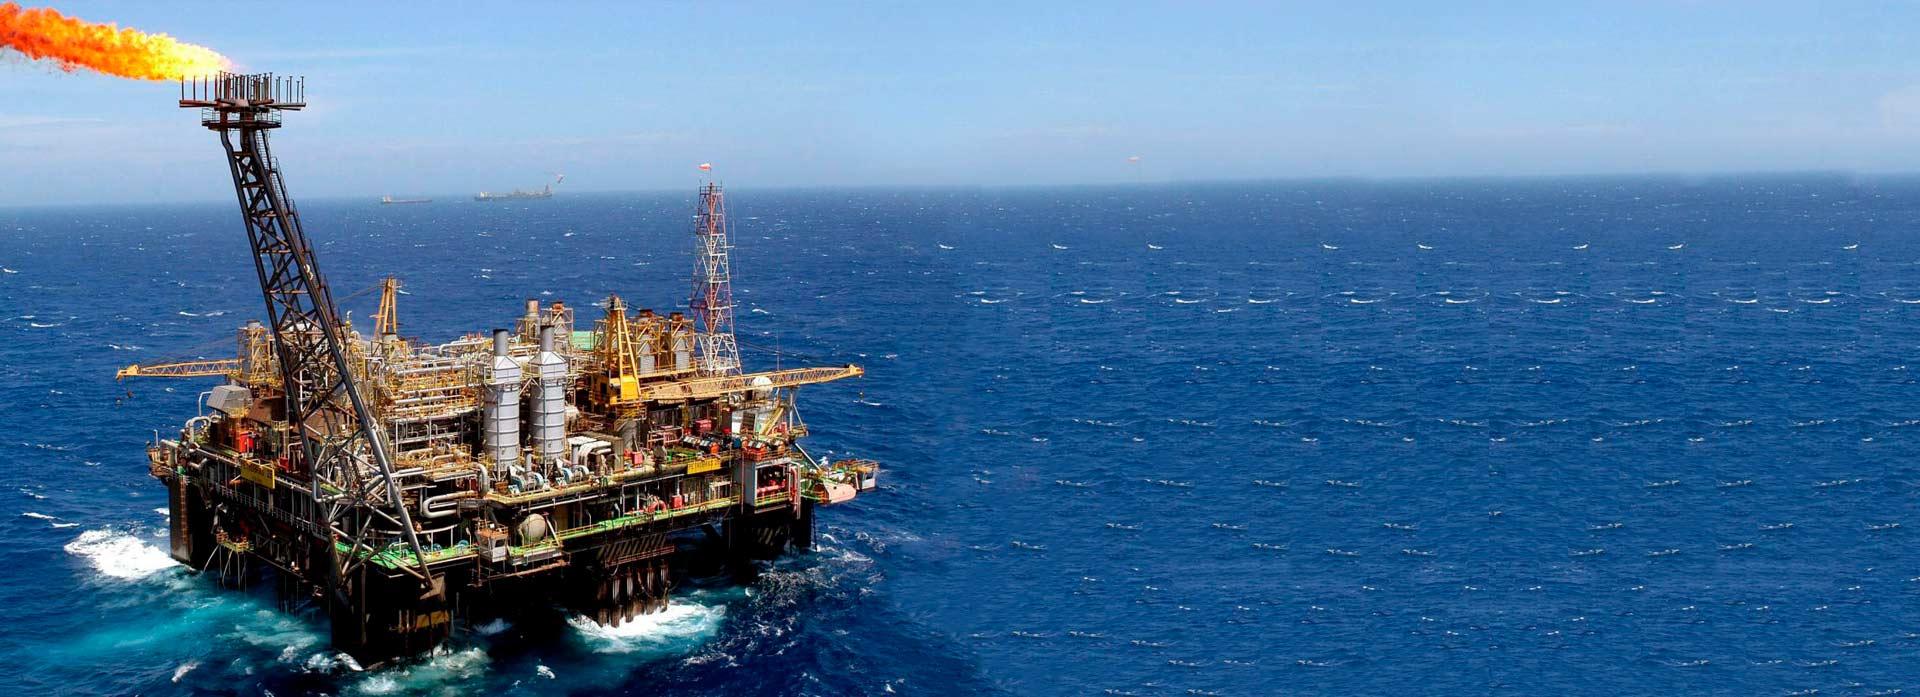 Detalhes - Seguro Riscos de Petróleo Sompo